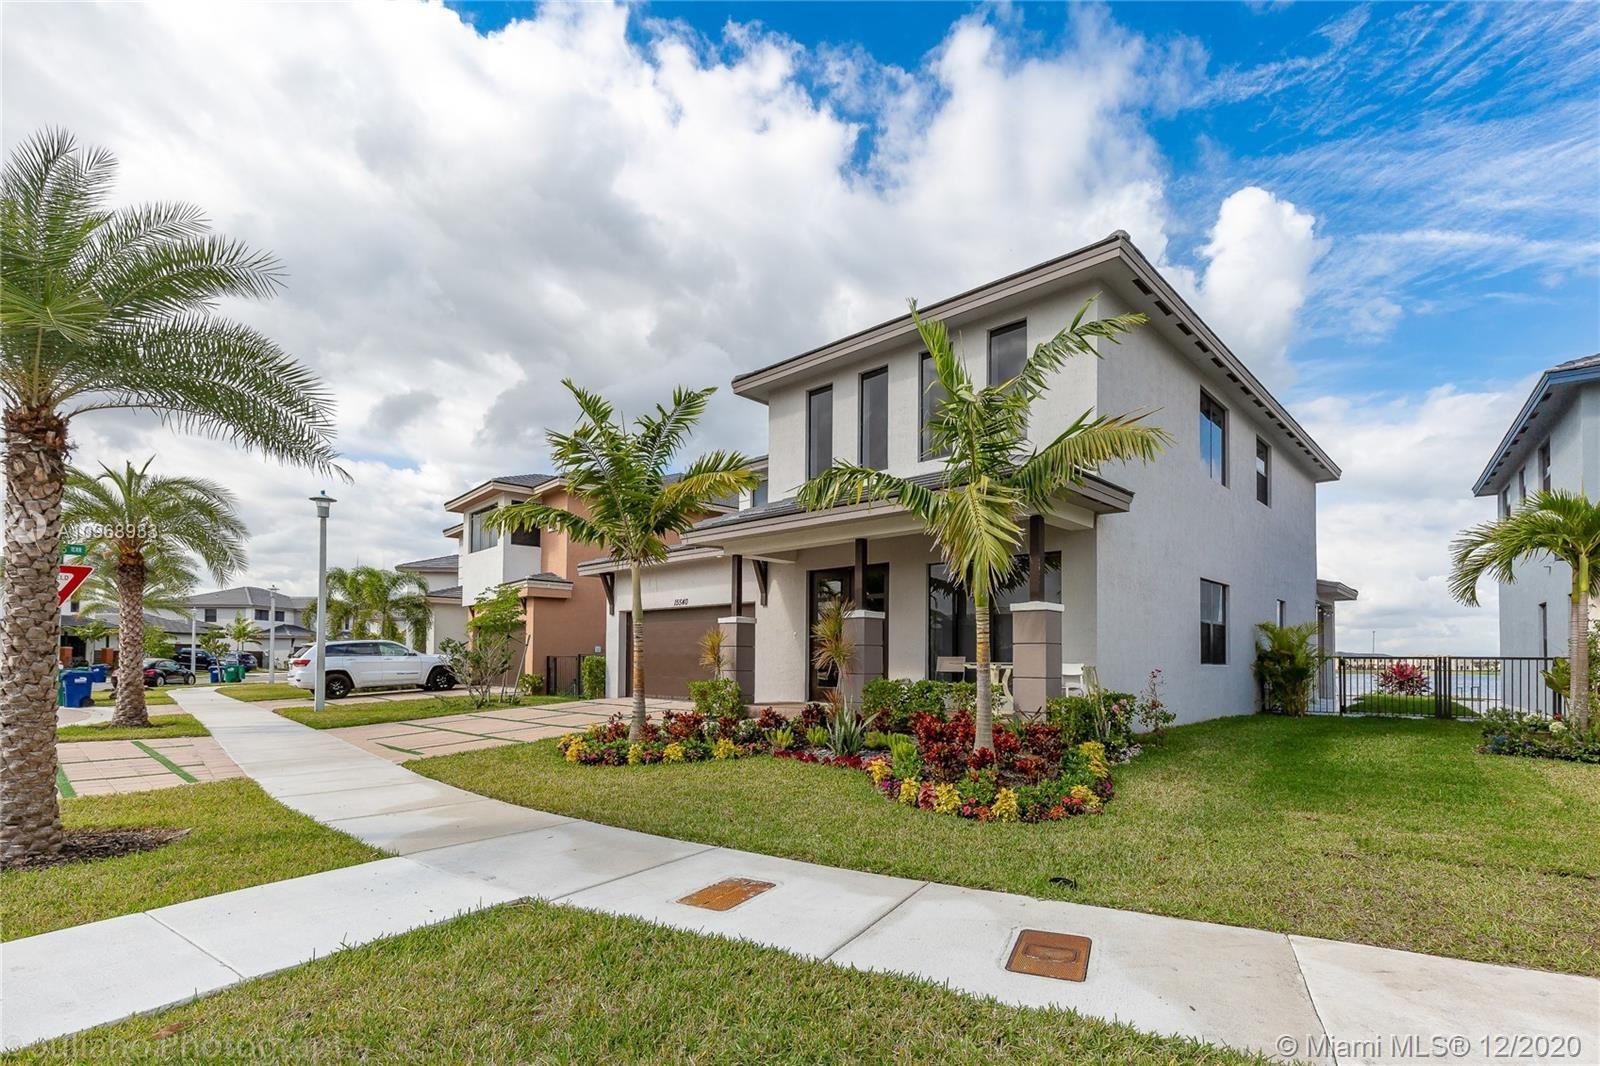 15540 NW 88th Ave, Miami Lakes, FL 33018 - #: A10968933